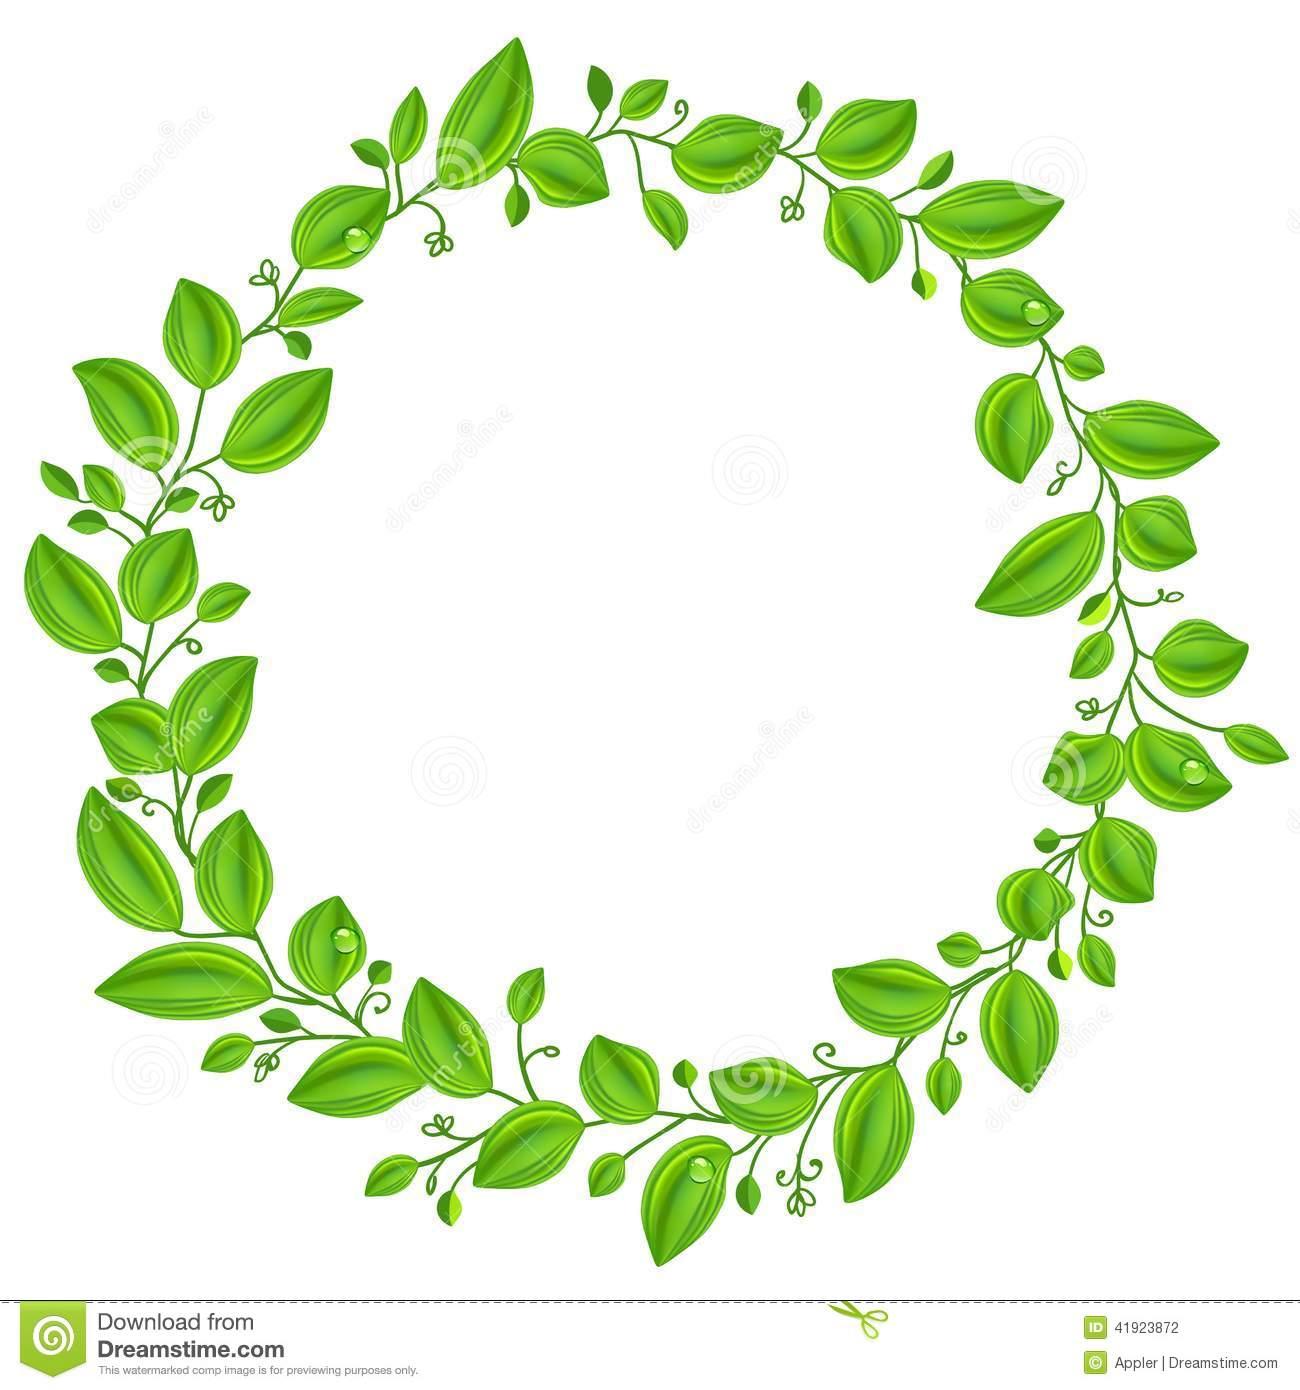 Green circle leaf clipart.